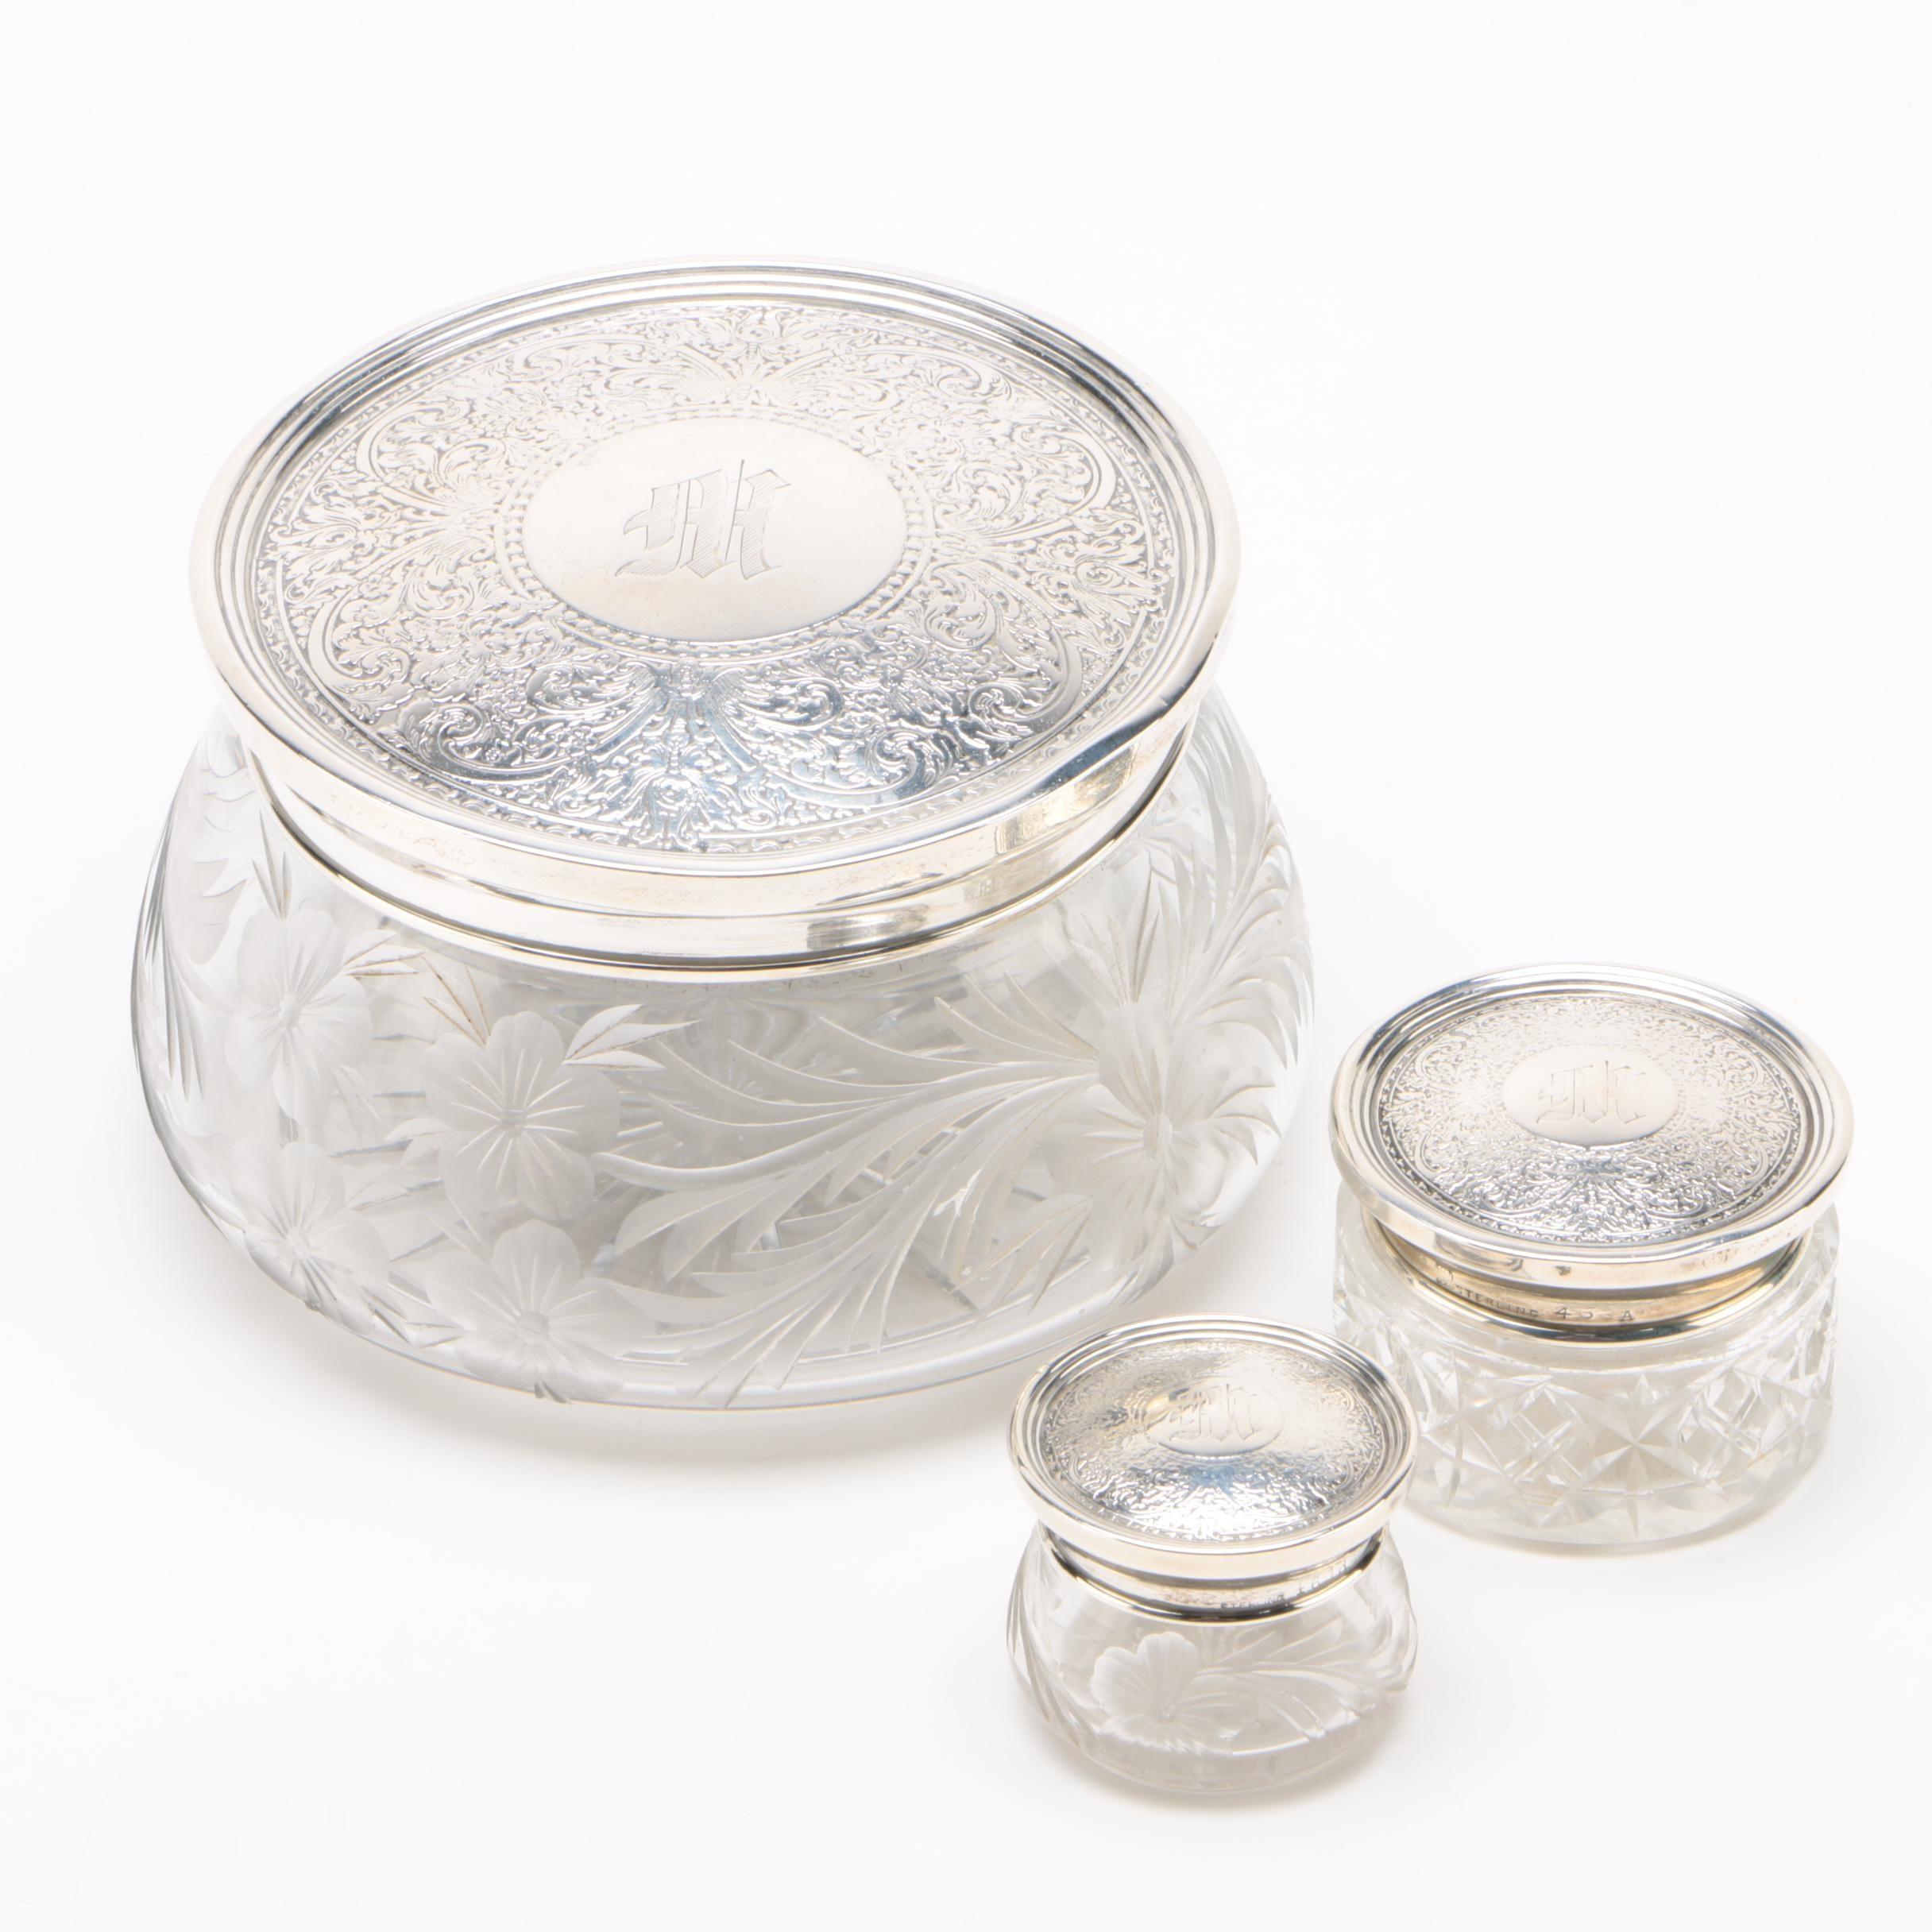 Meridan Britannia Co. Sterling and Cut Glass Vanity Jars